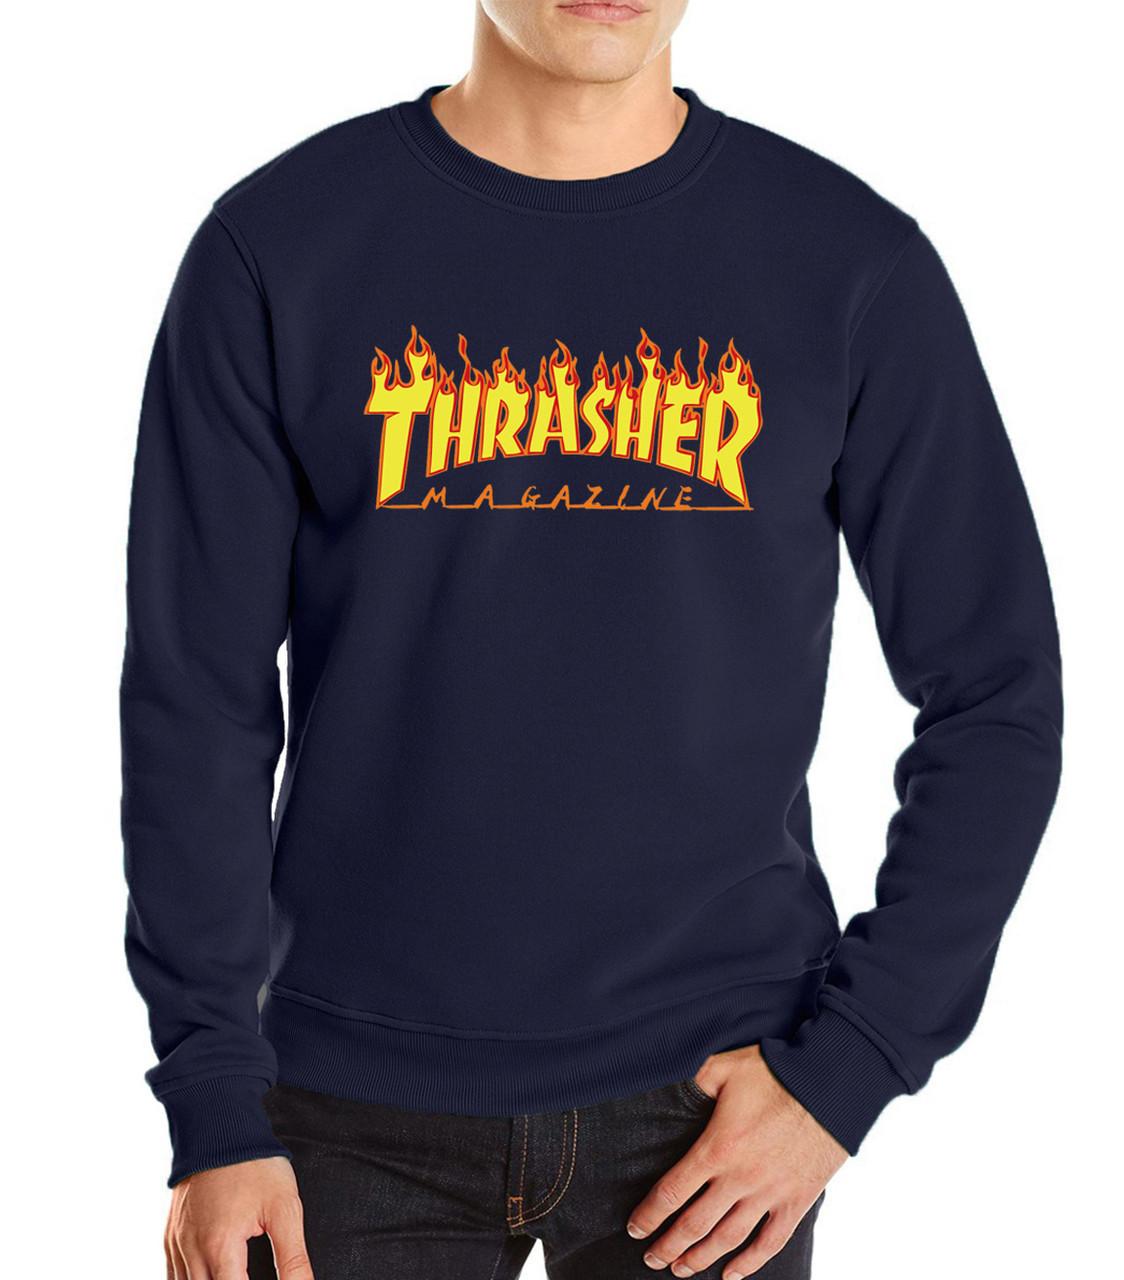 Світшот синій Thrasher Magazine| Кофта Thrasher Magazine